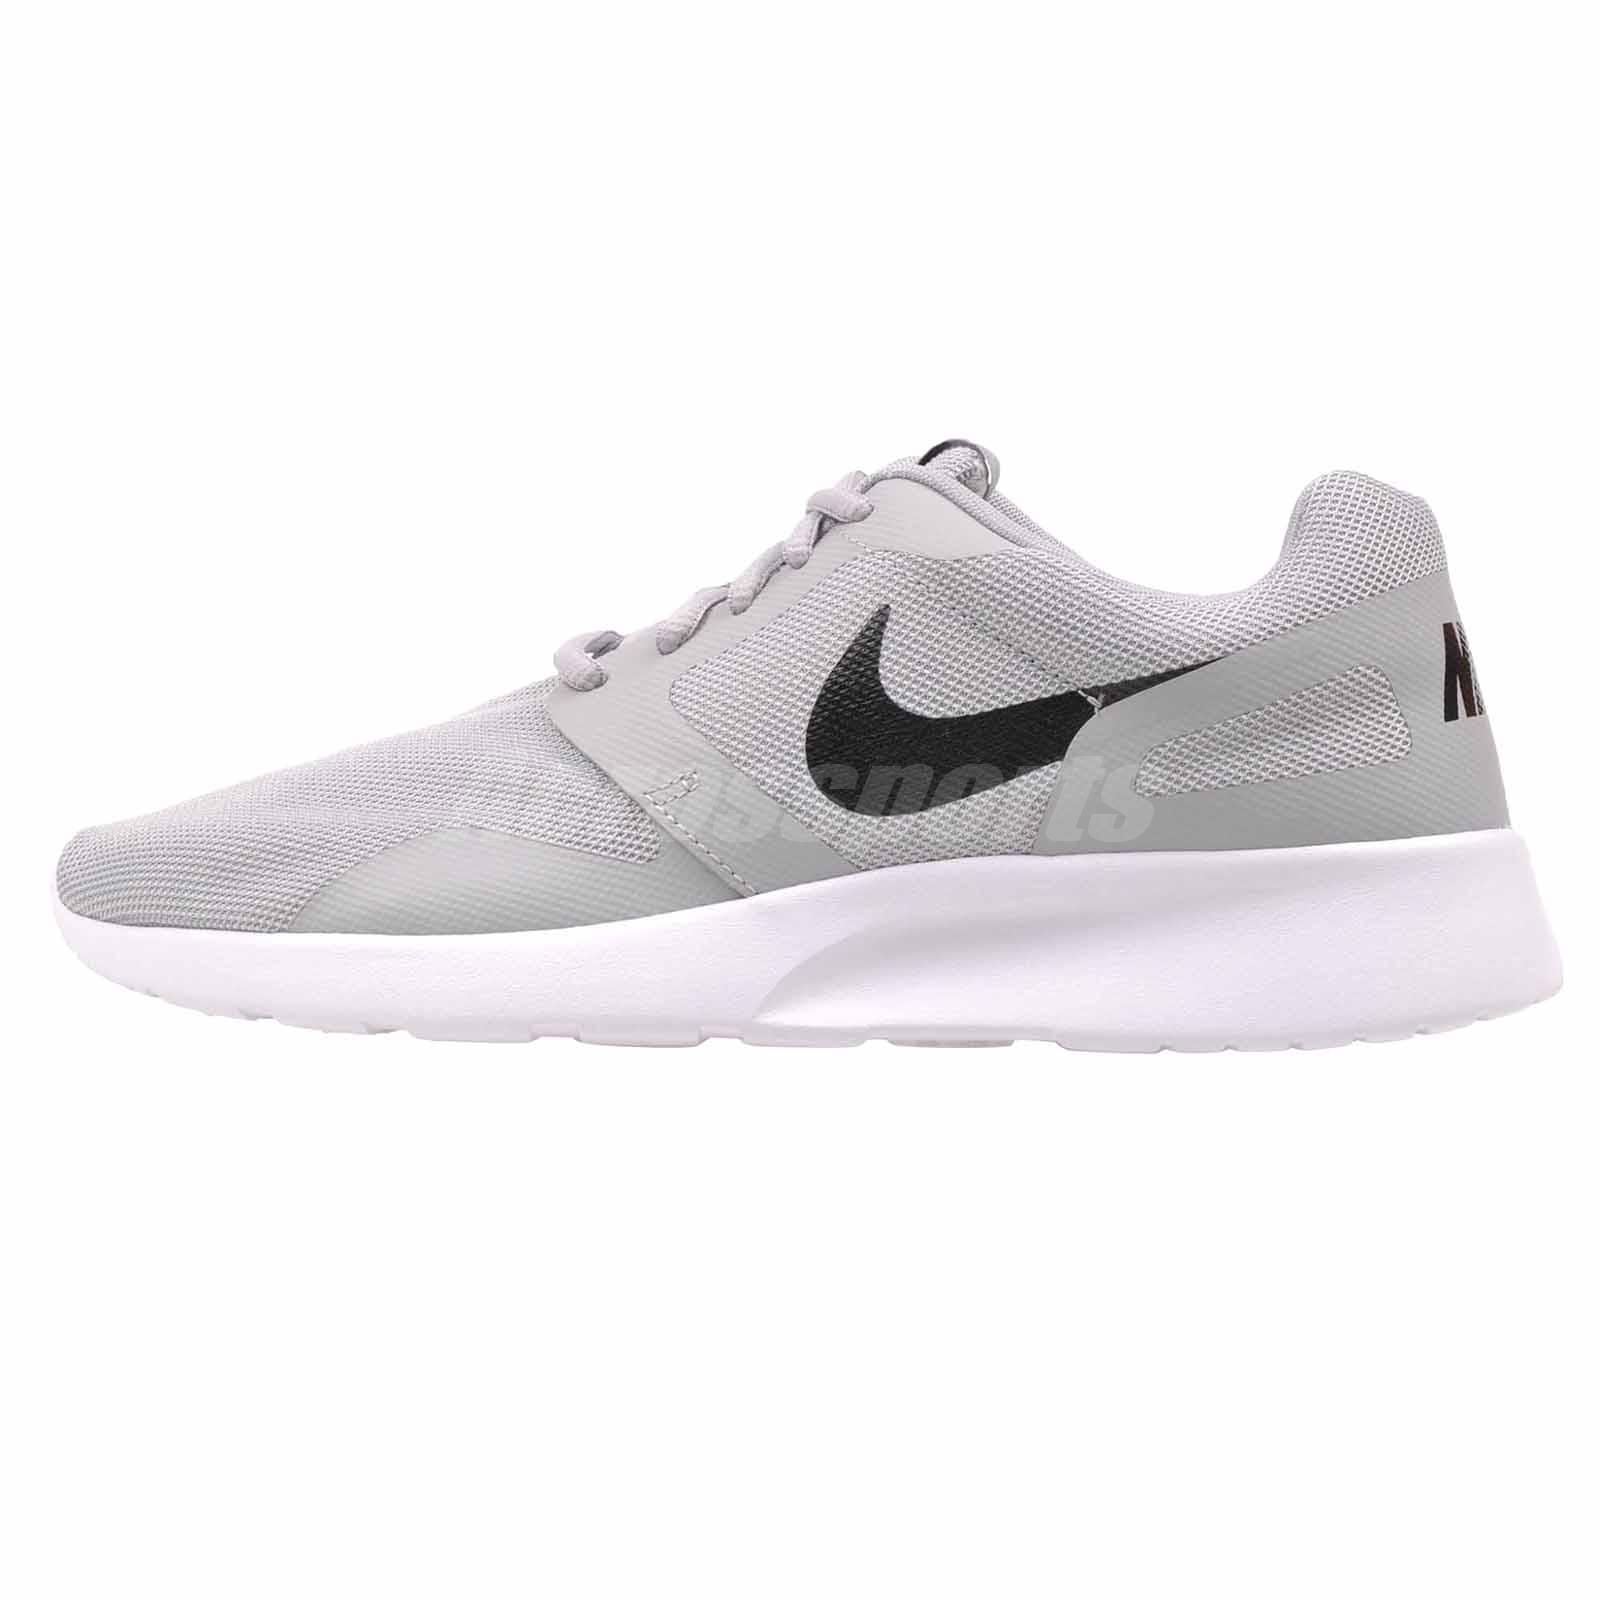 newest 6dd62 f85d9 Nike Kaishi NS Running Mens Shoes Grey Black White 747492-003